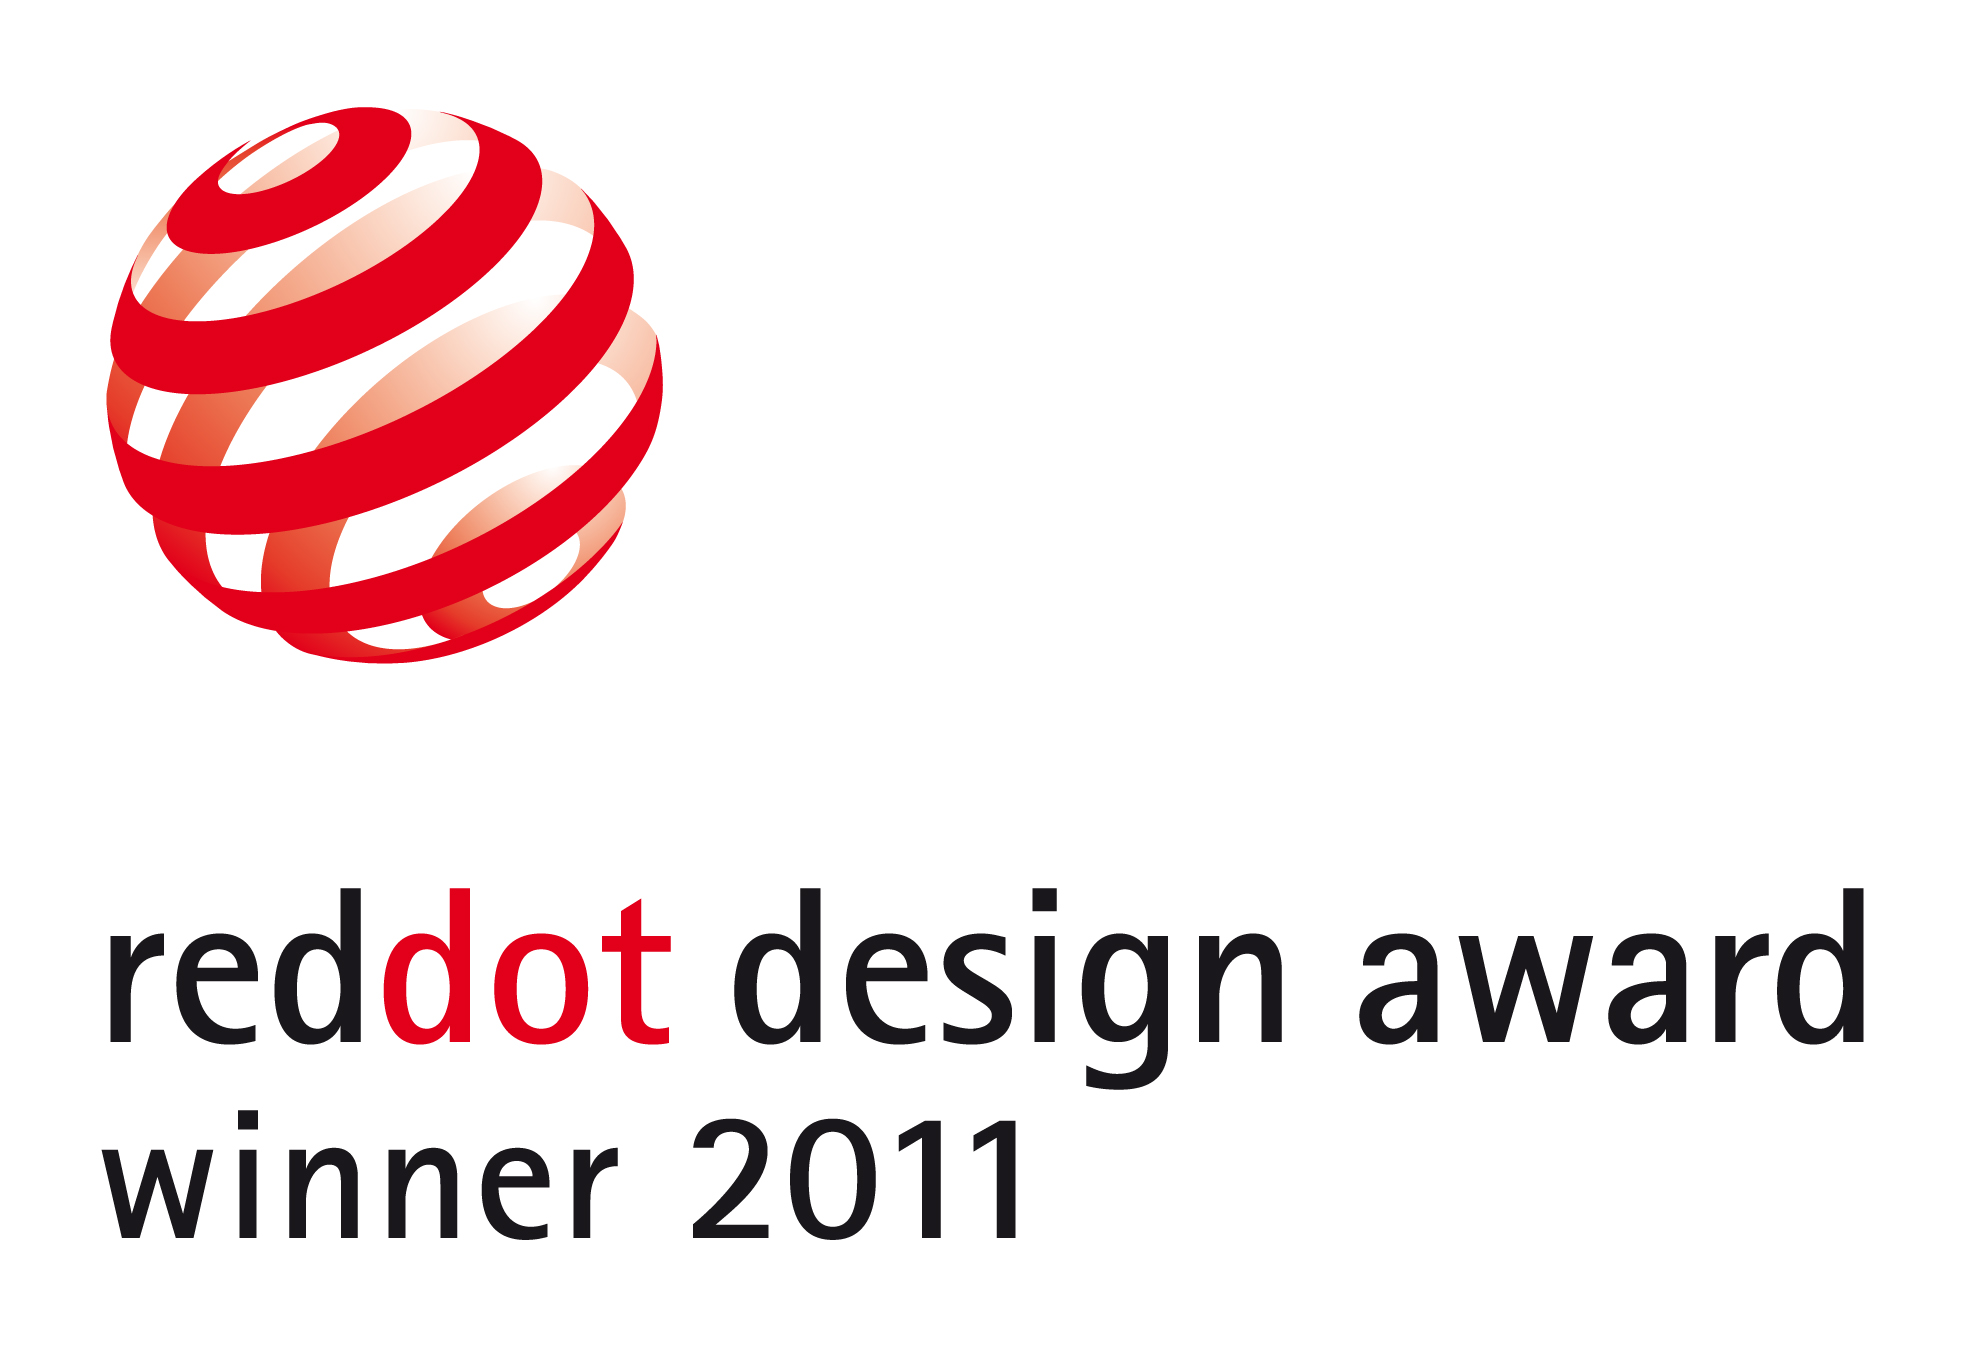 2011-reddot-design-award